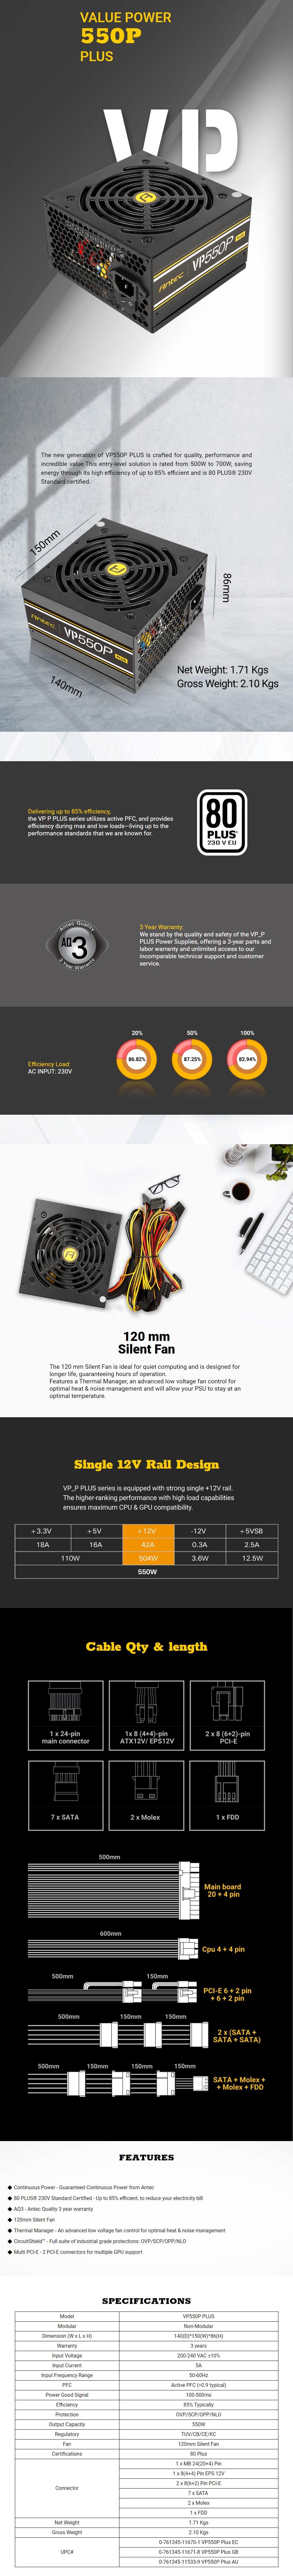 Antec VP550P PLUS 550W 80+ PSU 120mm Power Supply - Overview 1